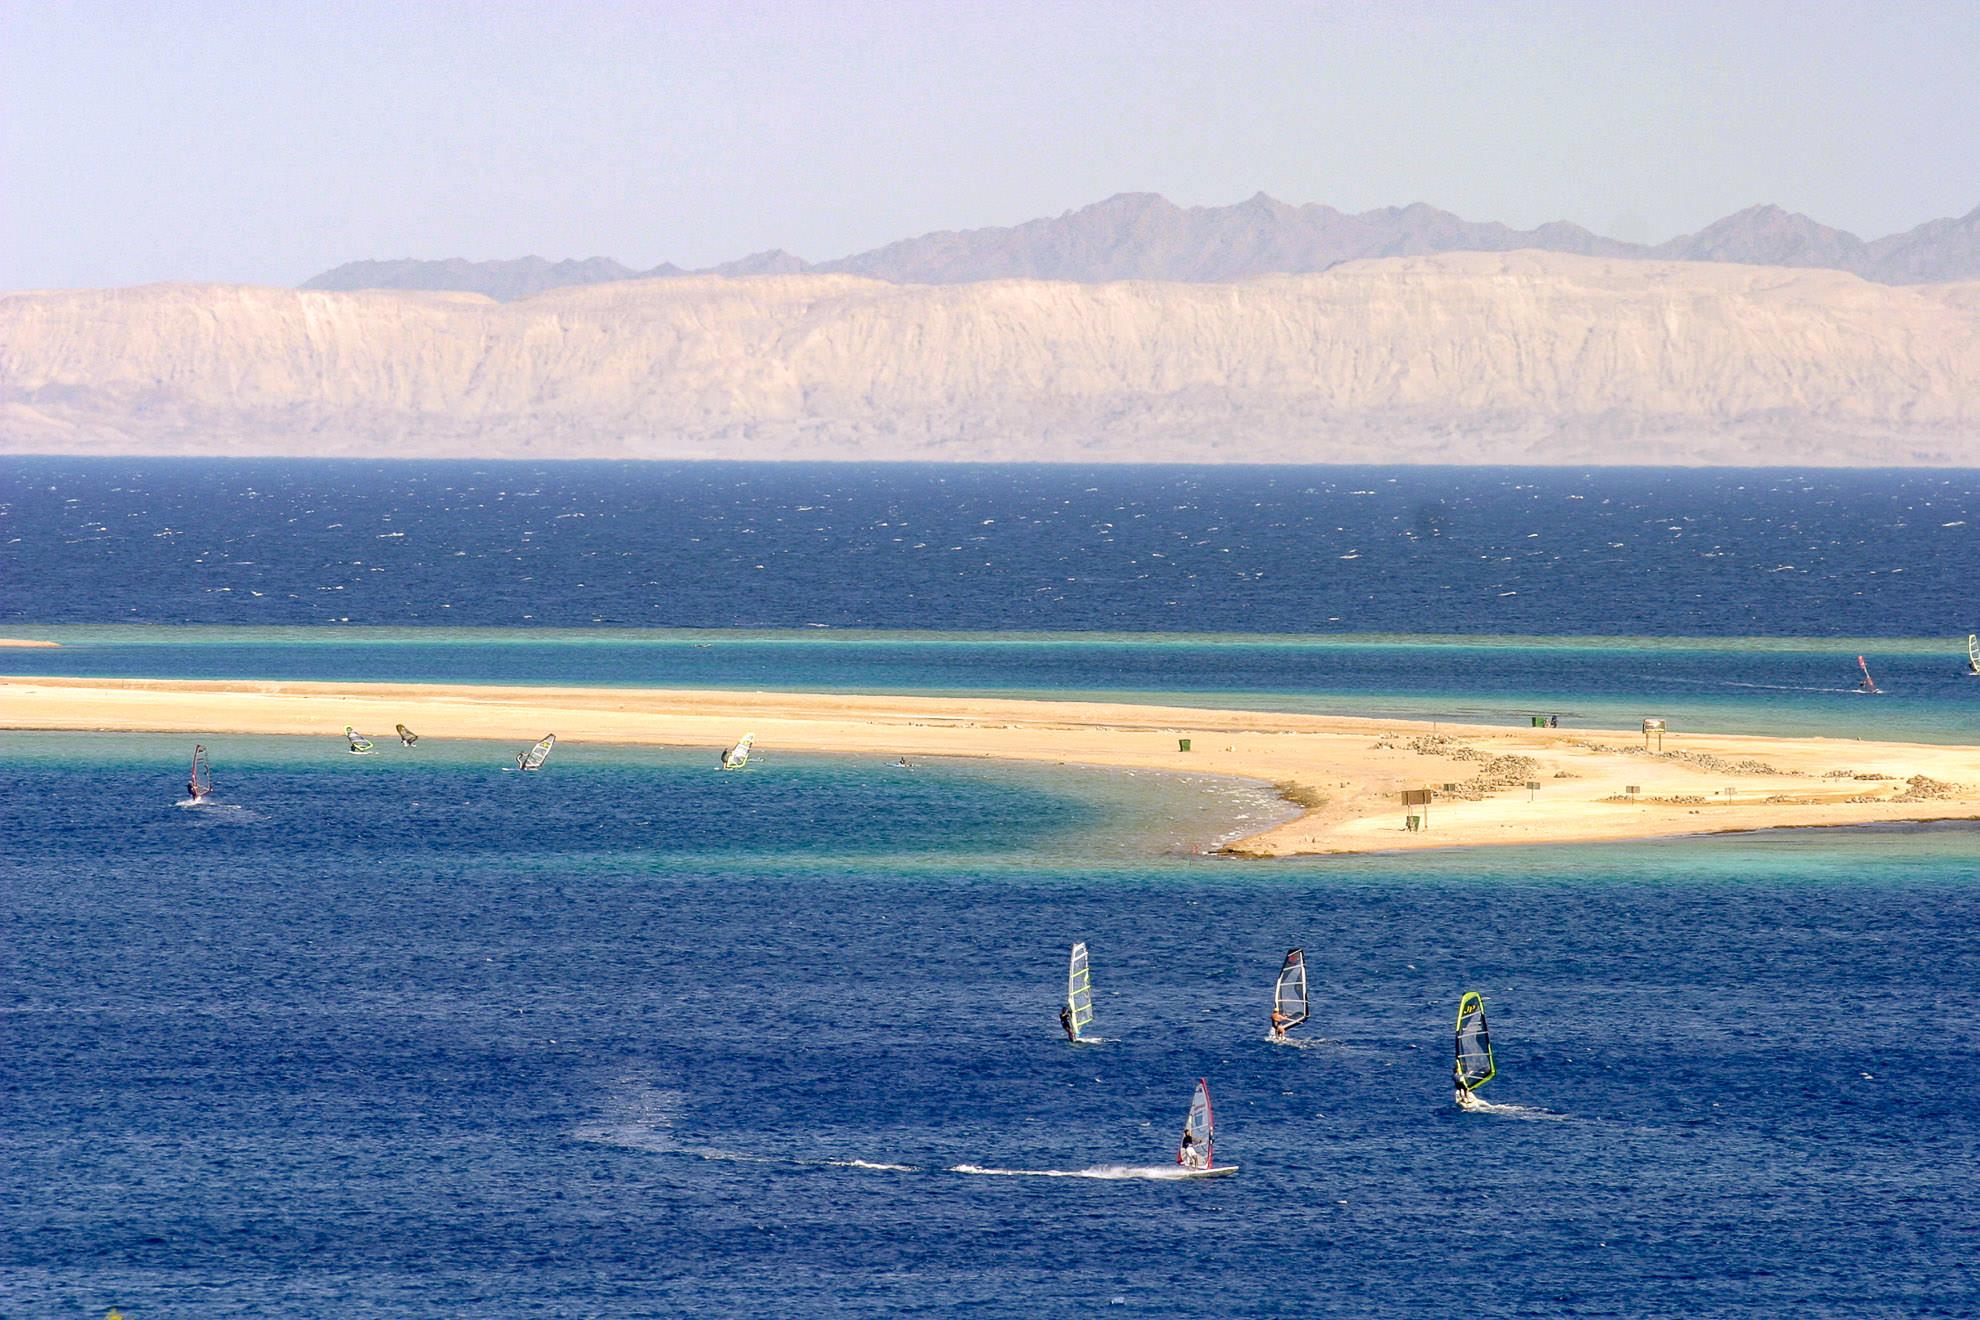 Windsurfing Egypt